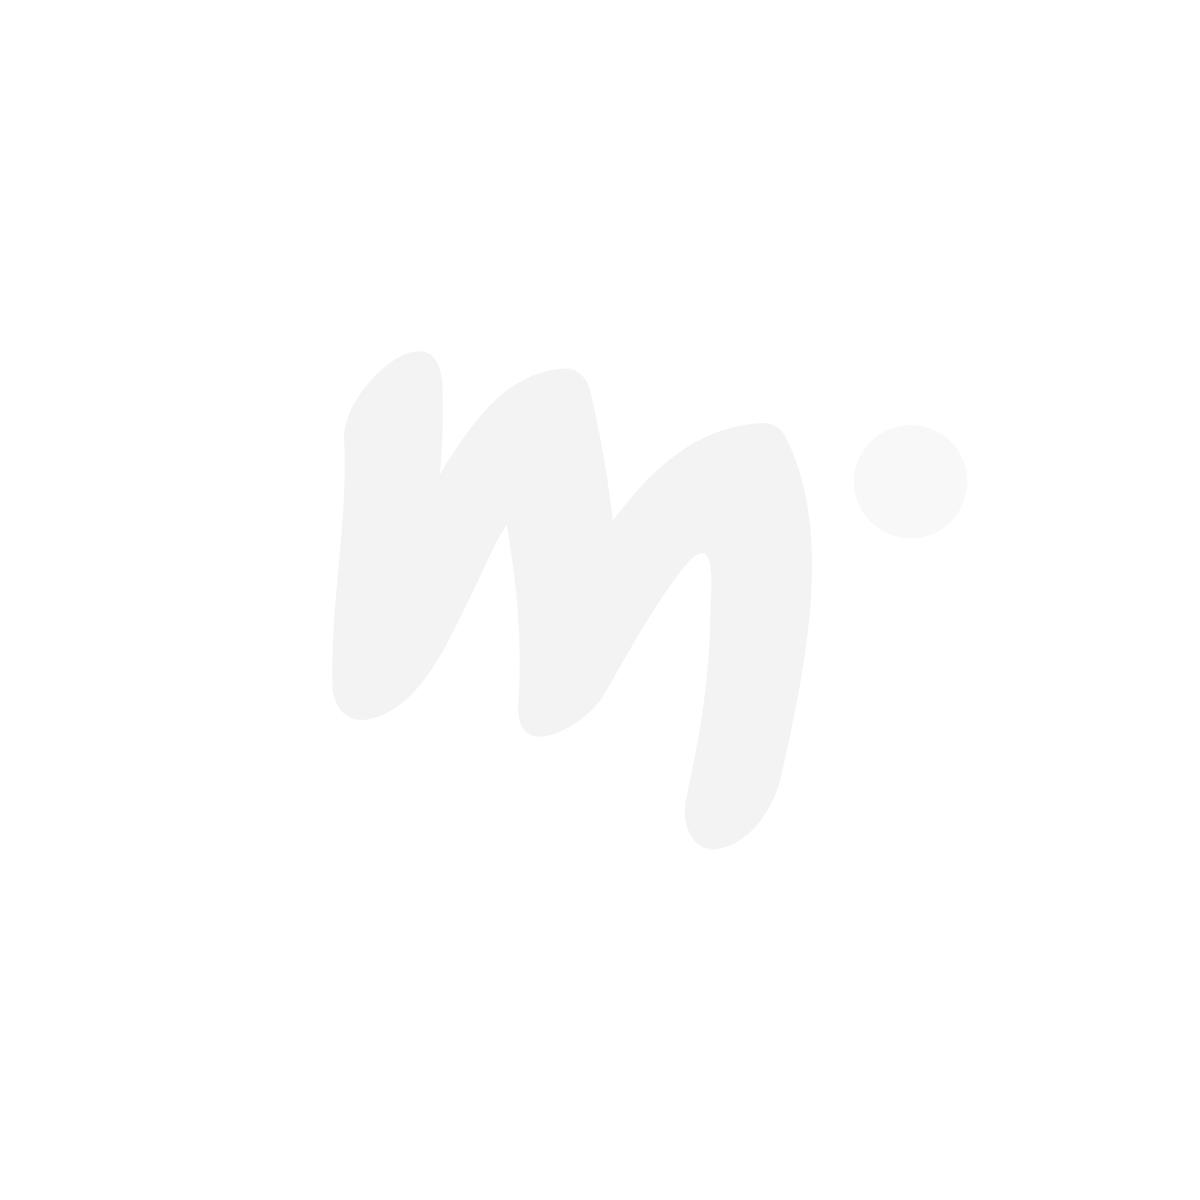 Mx Deco Musiikkitonttu 70 cm